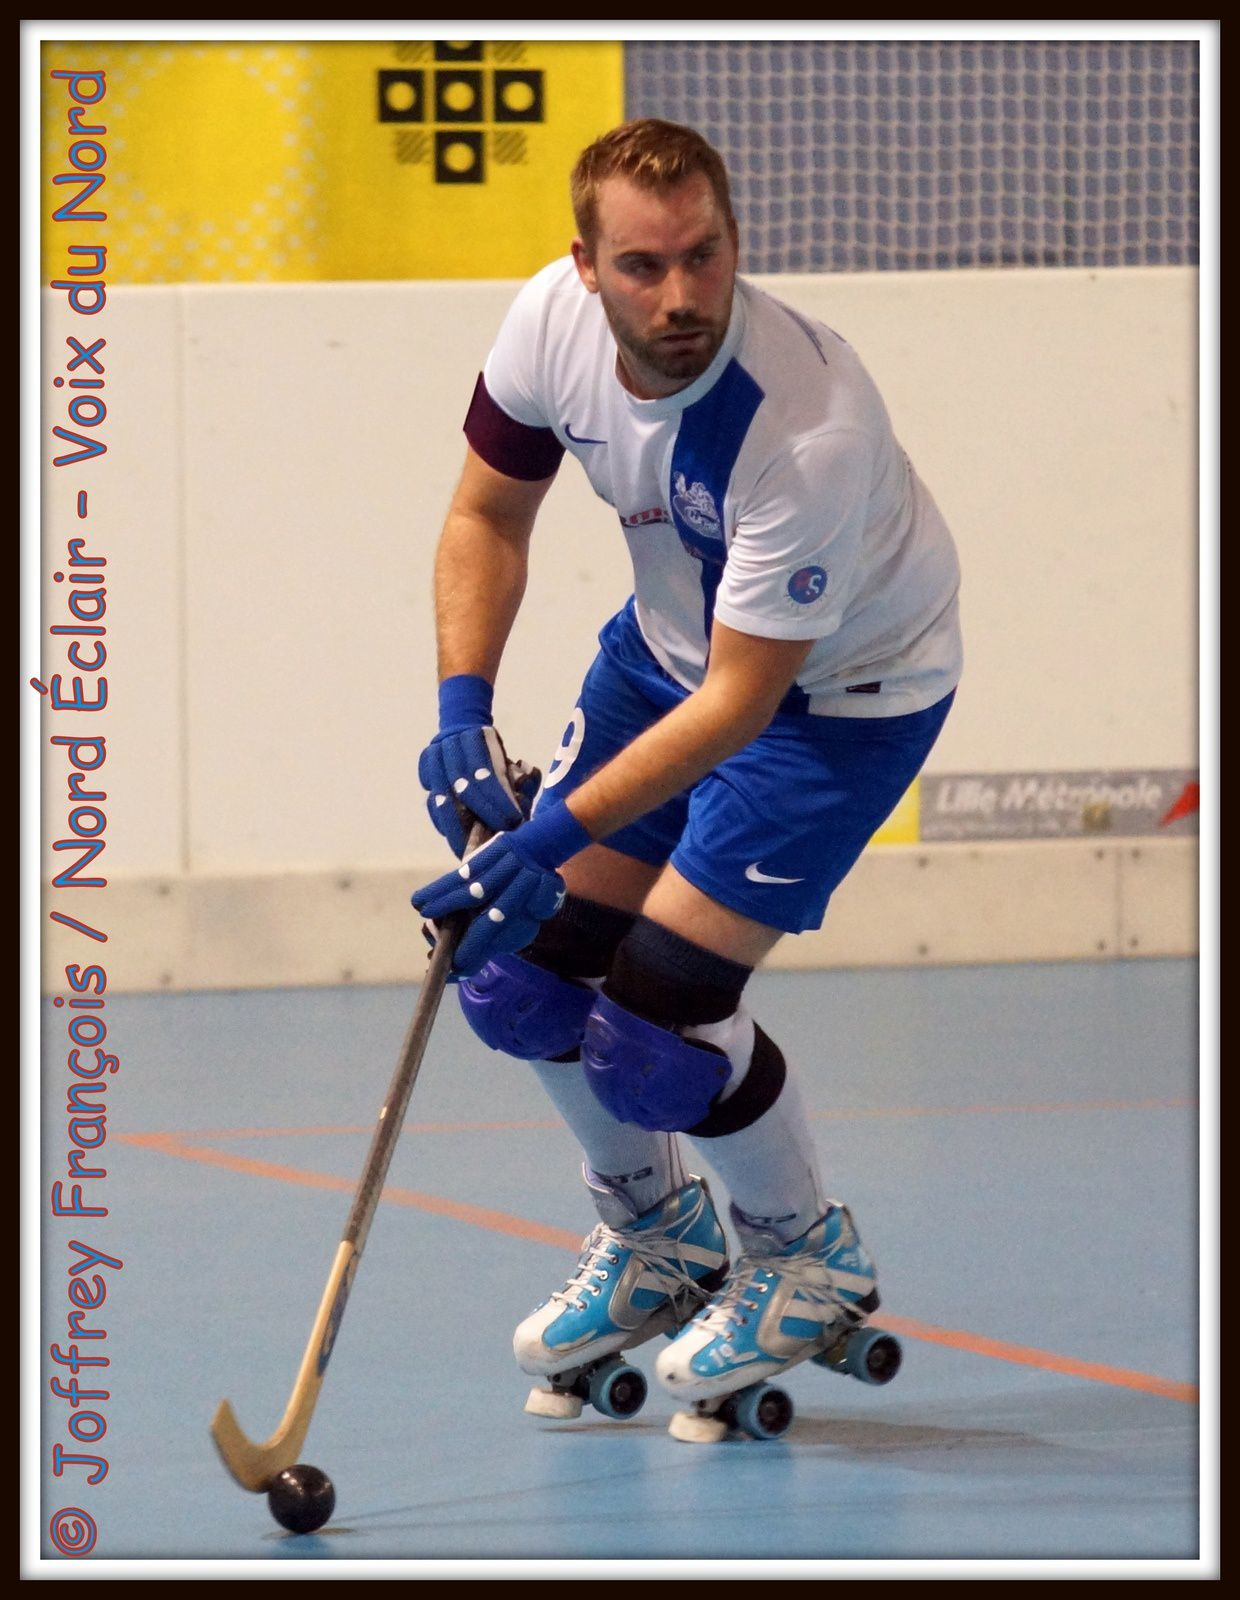 01-02.10.16 Futsal / Foot / Rink